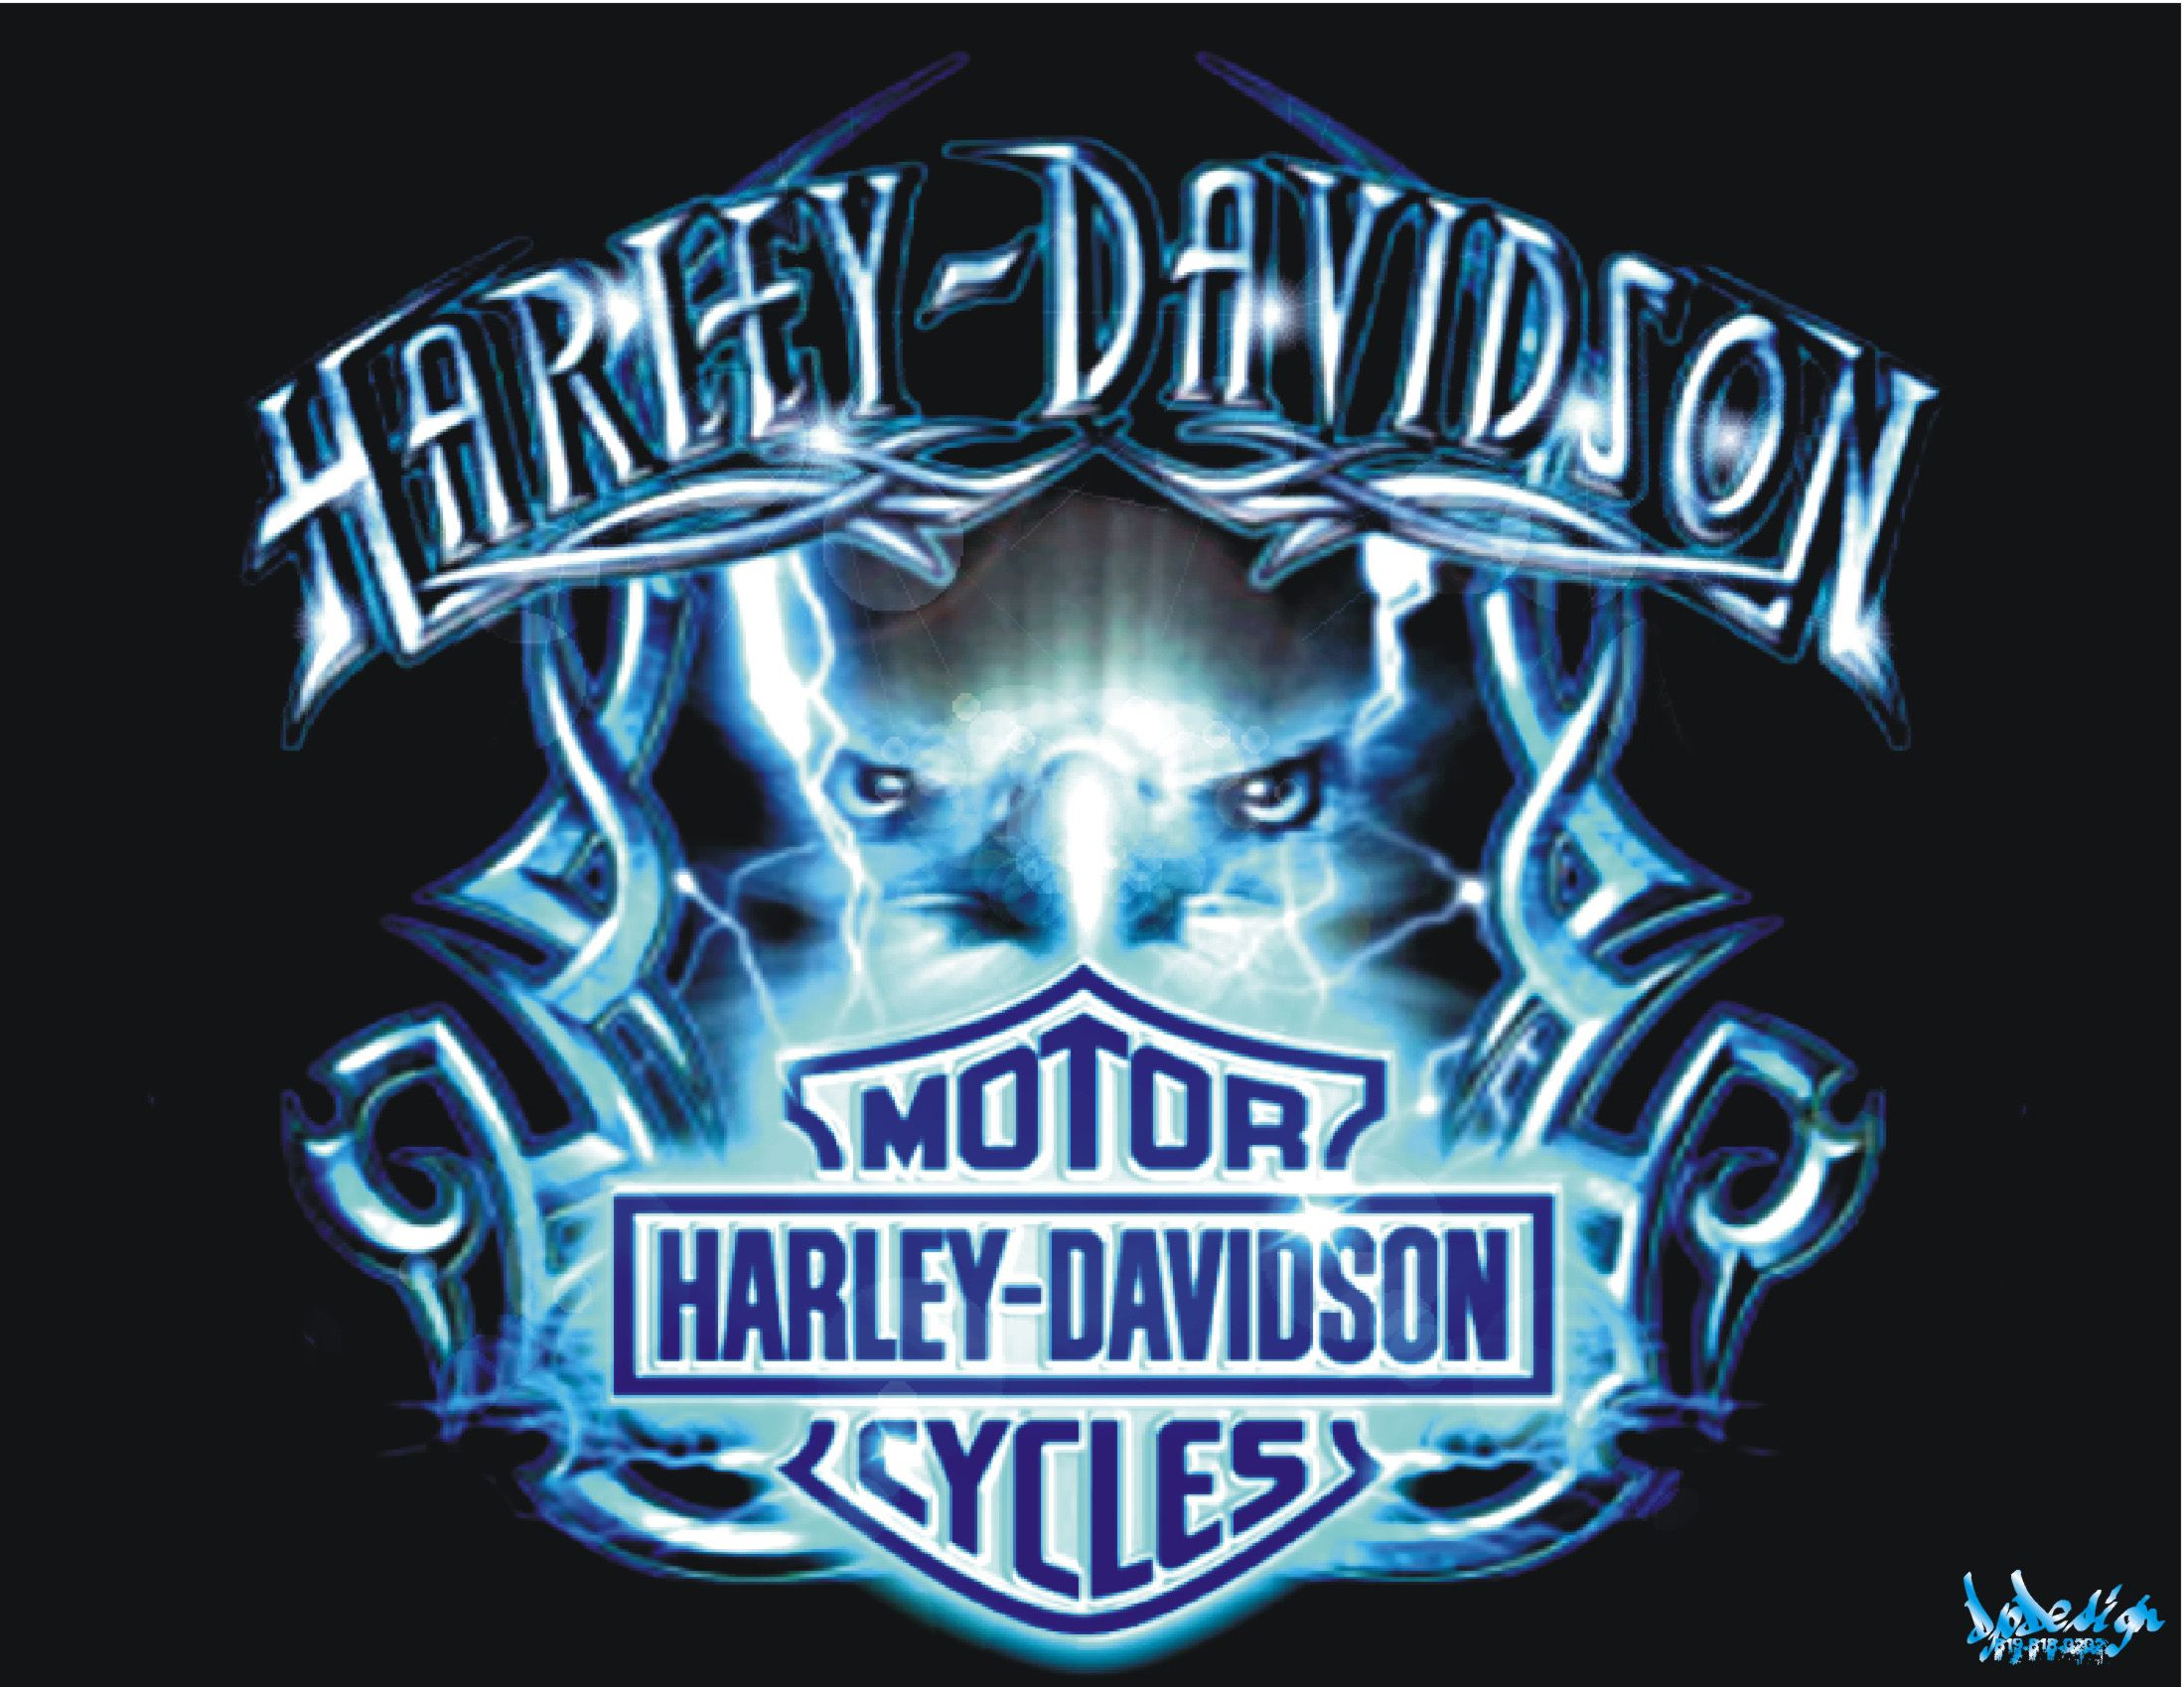 Harley Davidson Women Symbols